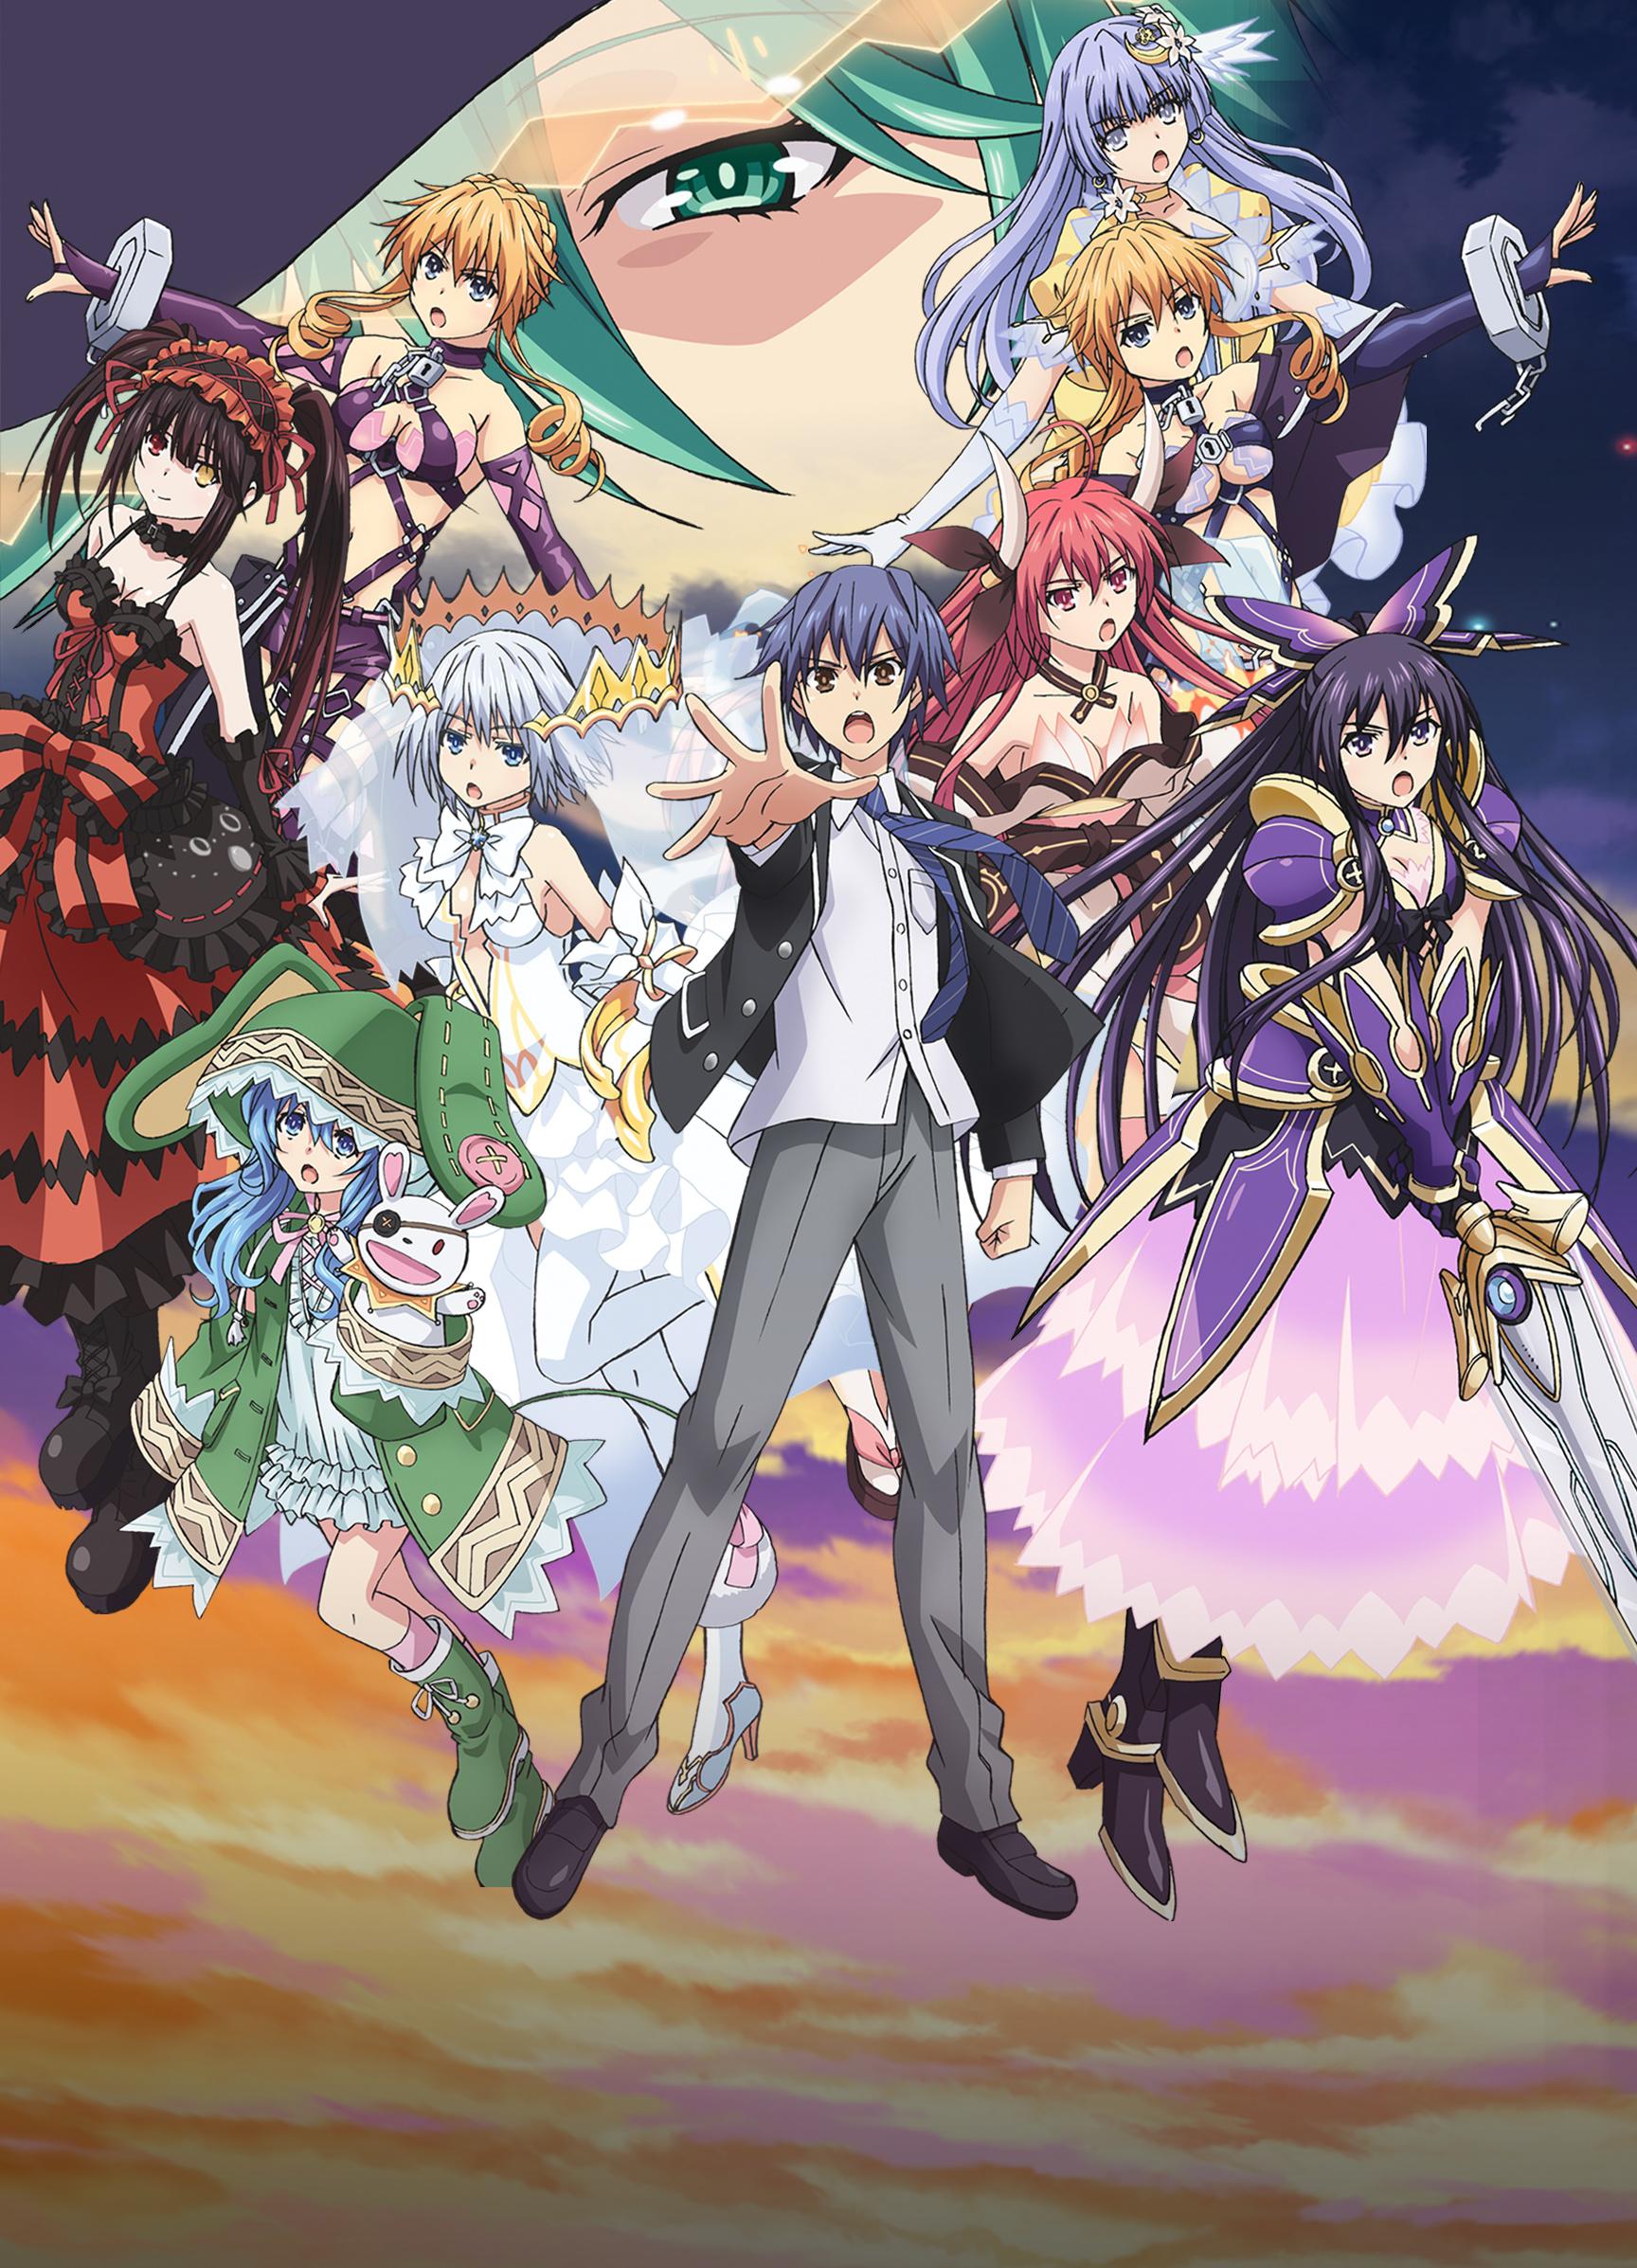 Date A Live Saison 3 Episode 4 Vostfr : saison, episode, vostfr, Watch, Comedy,, Service,, Romance,, Anime, Funimation